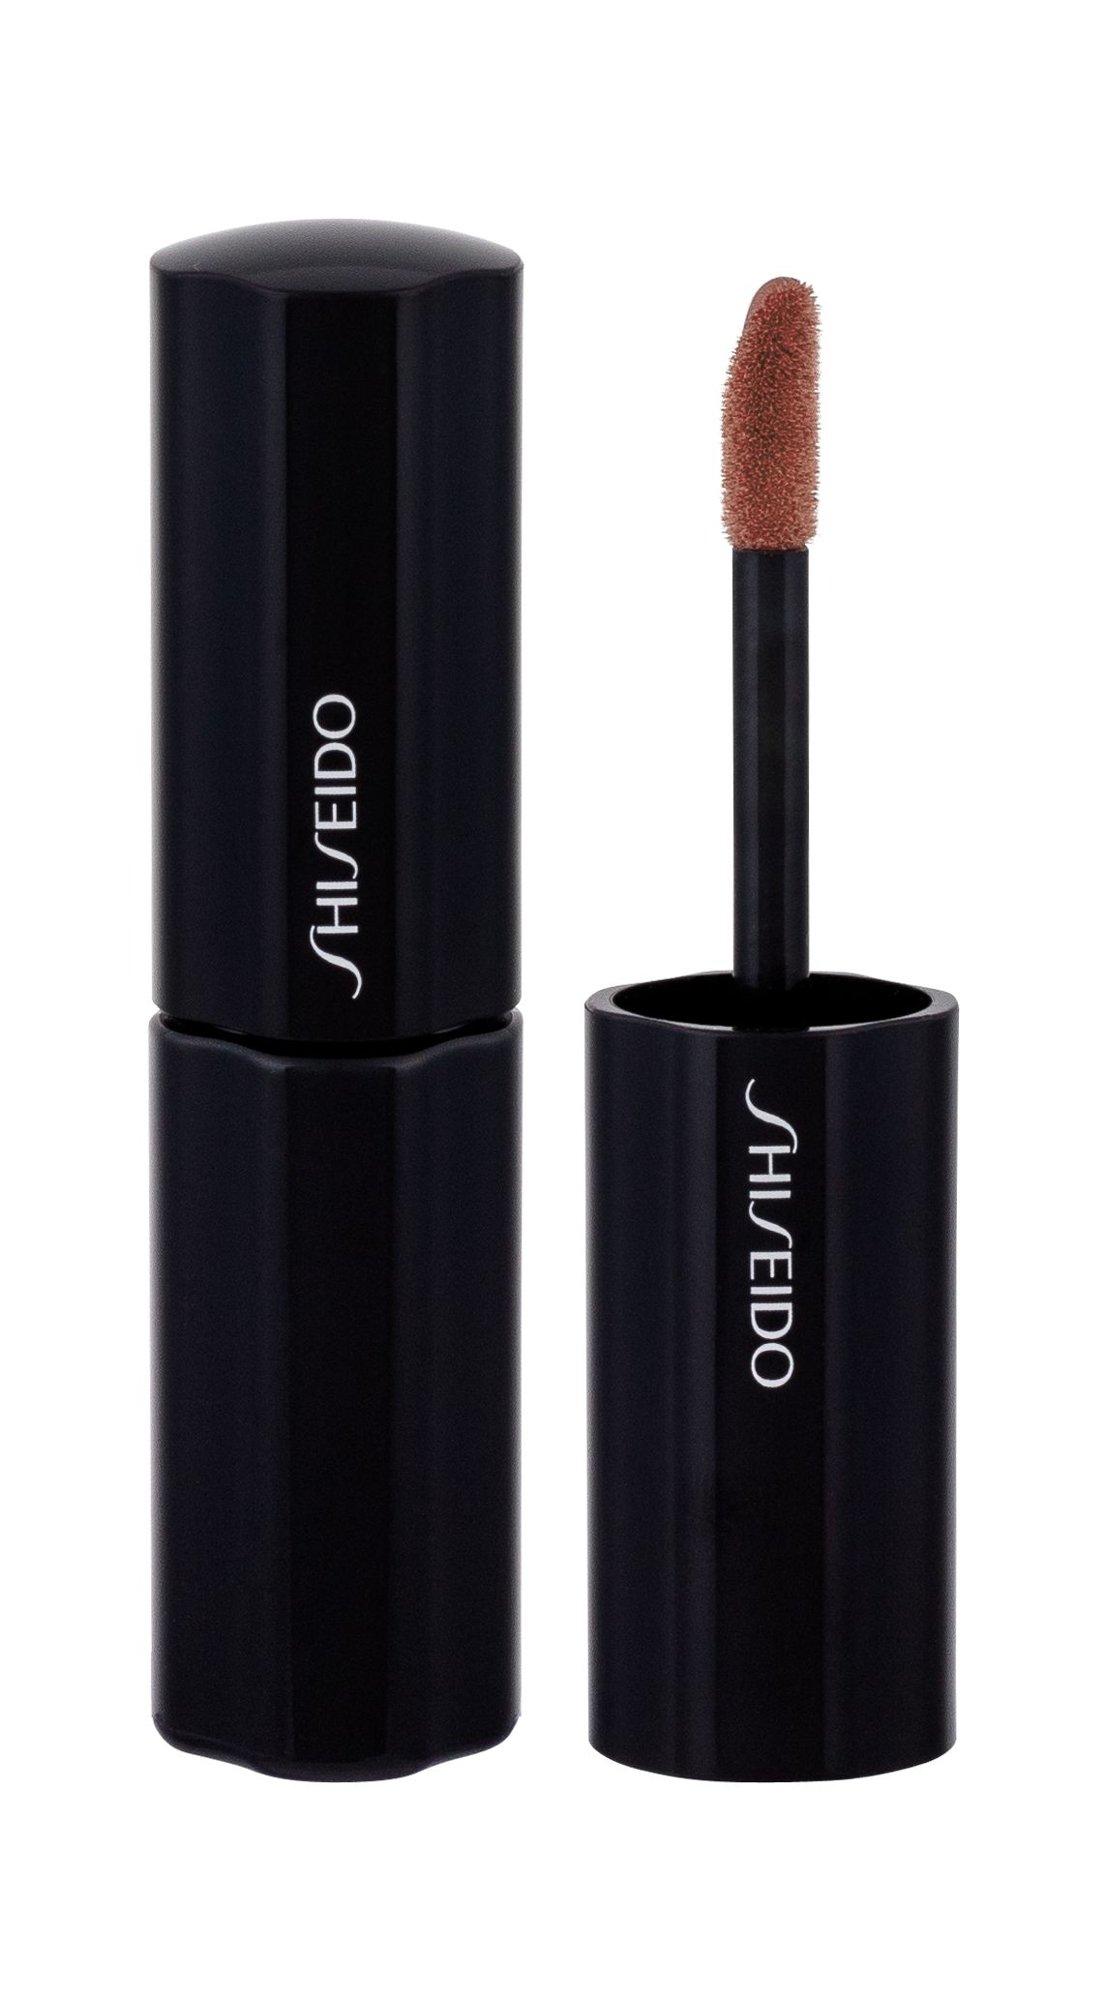 Shiseido Lacquer Rouge Lipstick 6ml RD728